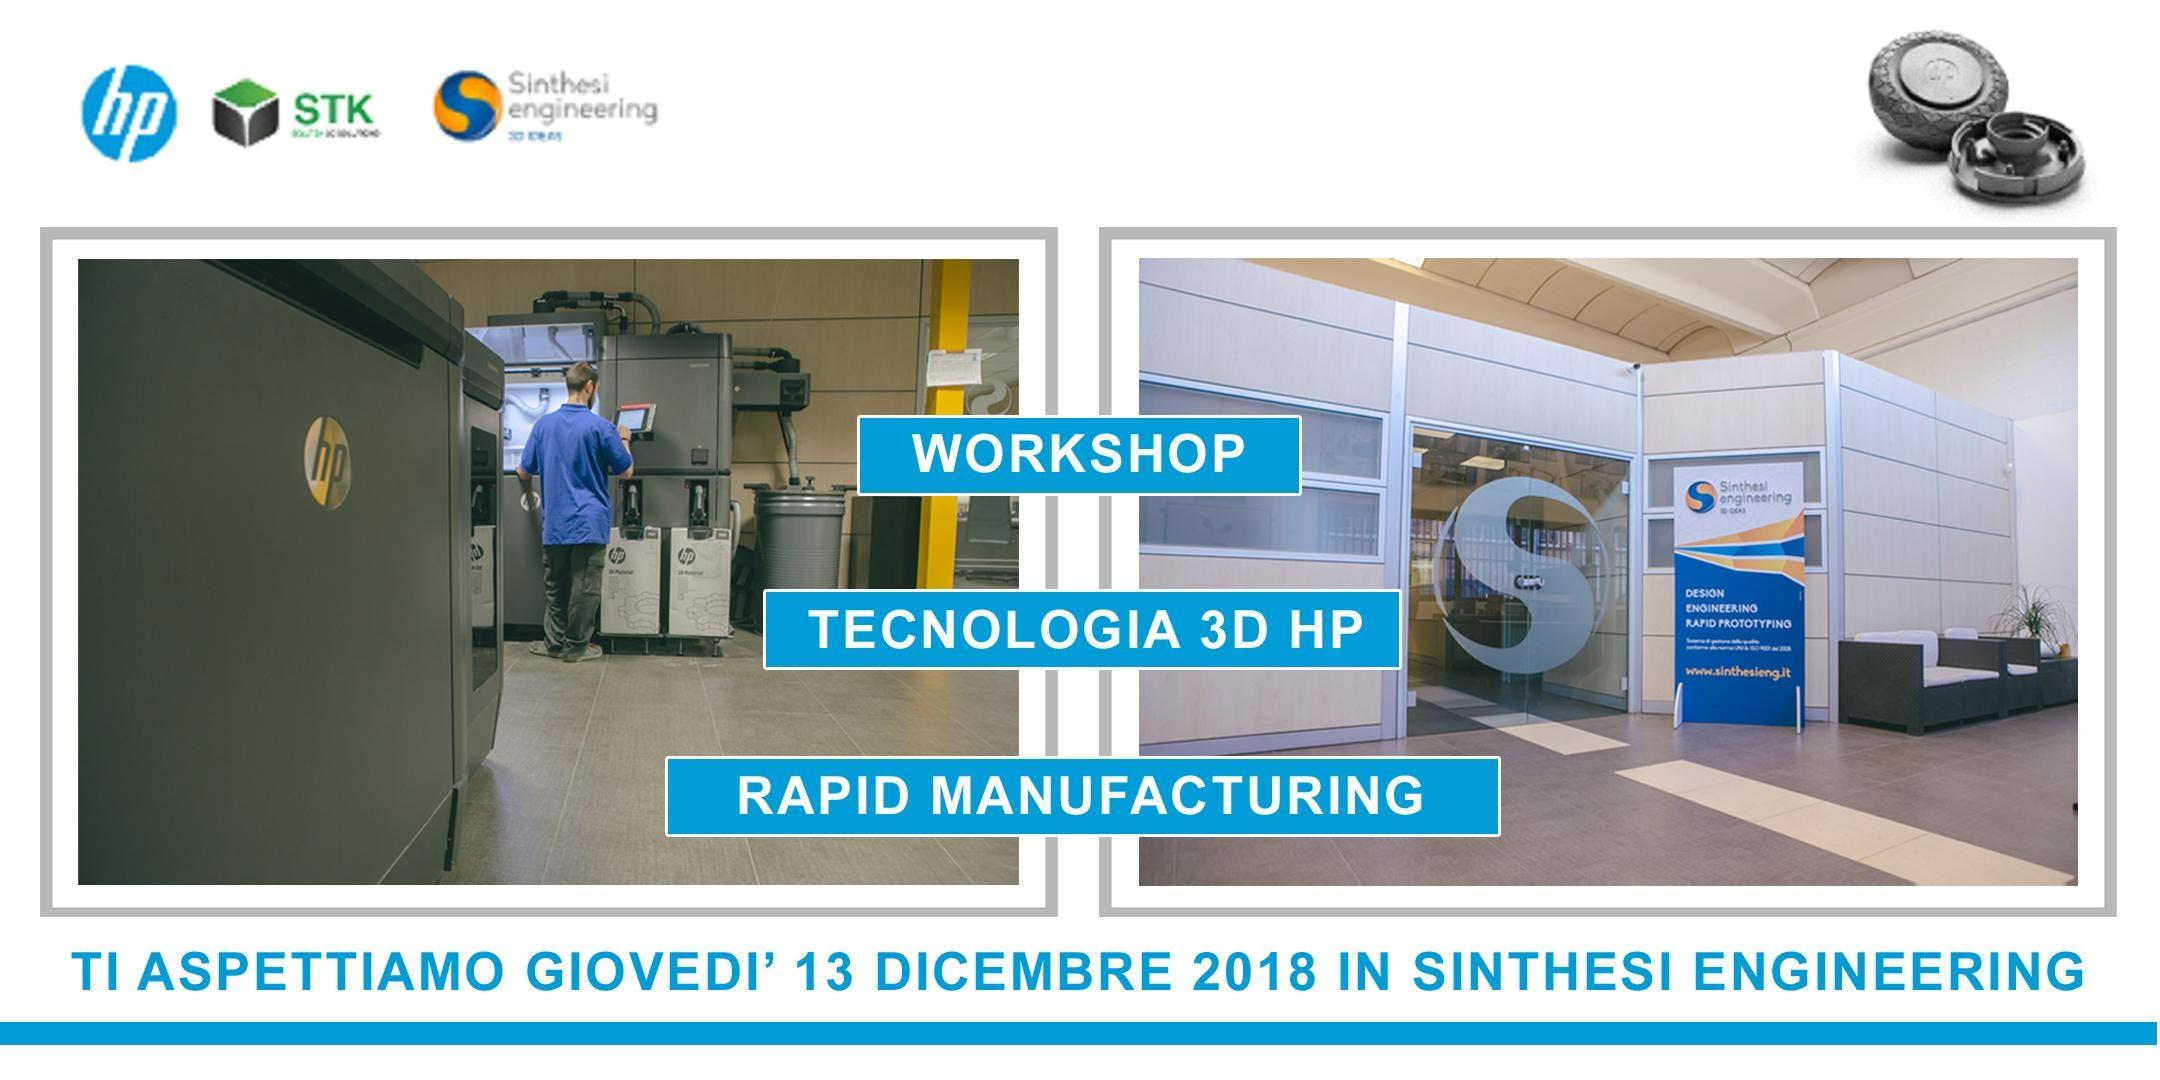 Workshop: Rapid Manufacturing con la tecnologia 3D HP